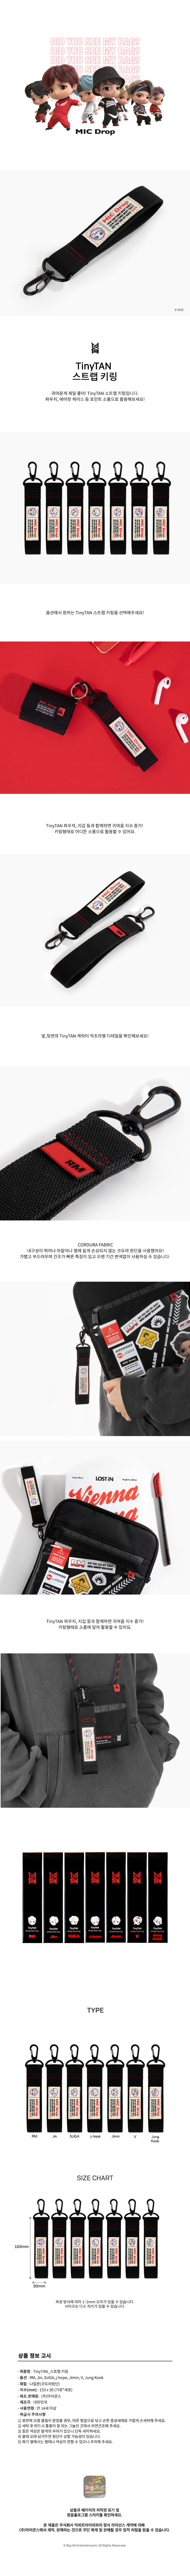 [BTS] TinyTAN Strap Keyring-holiholic.com